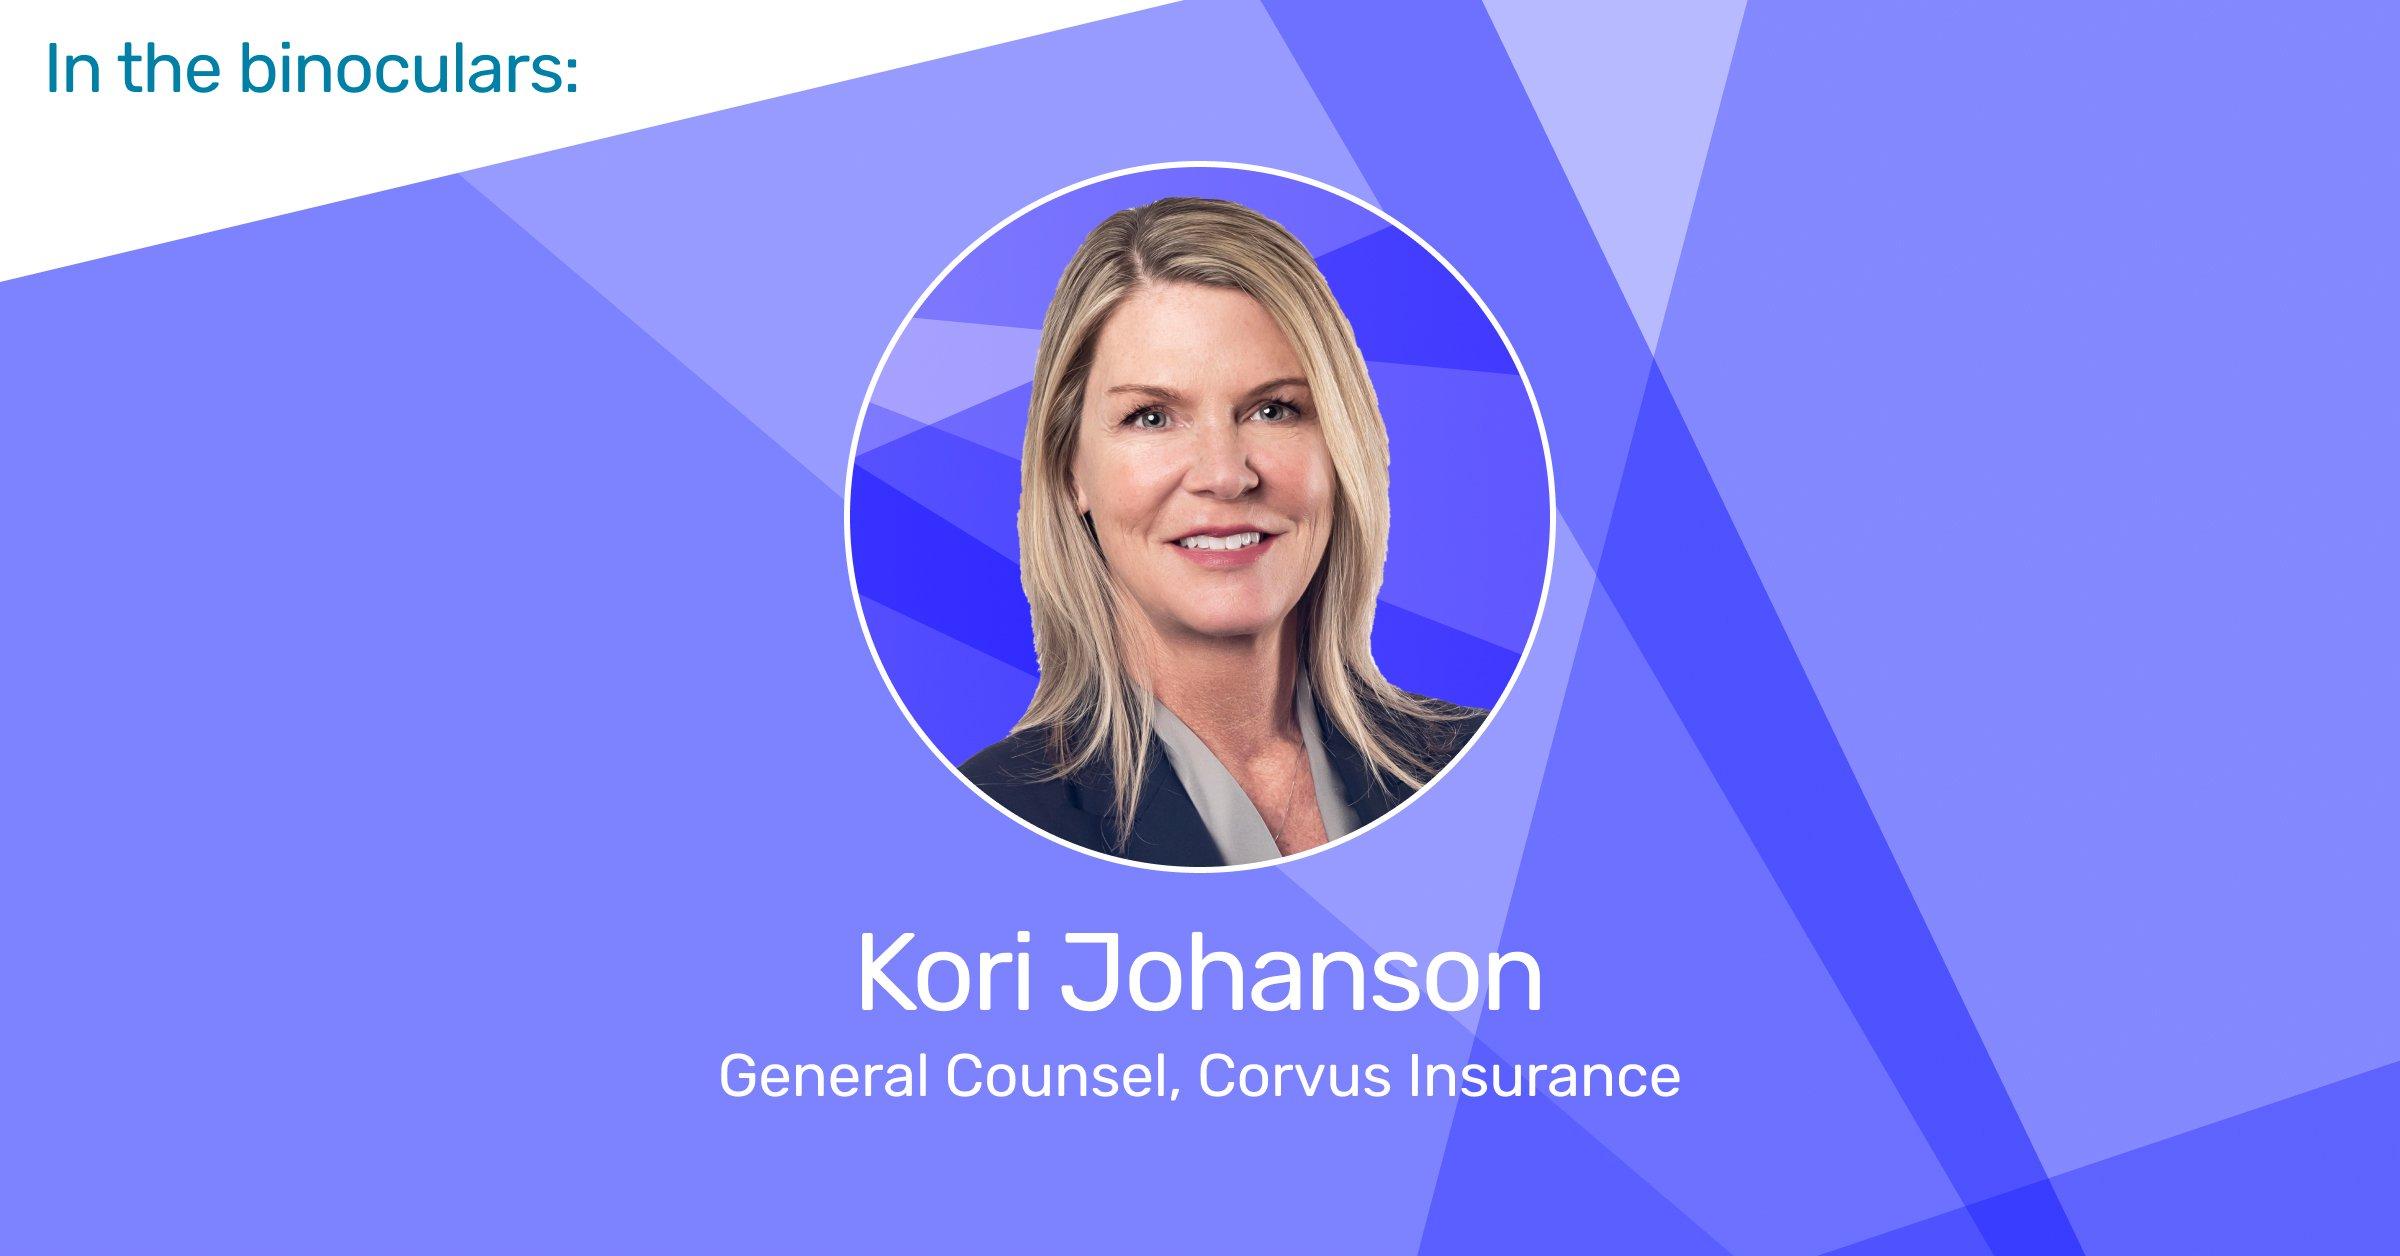 [RELATED POST] In the Binoculars: Kori Johanson, General Counsel